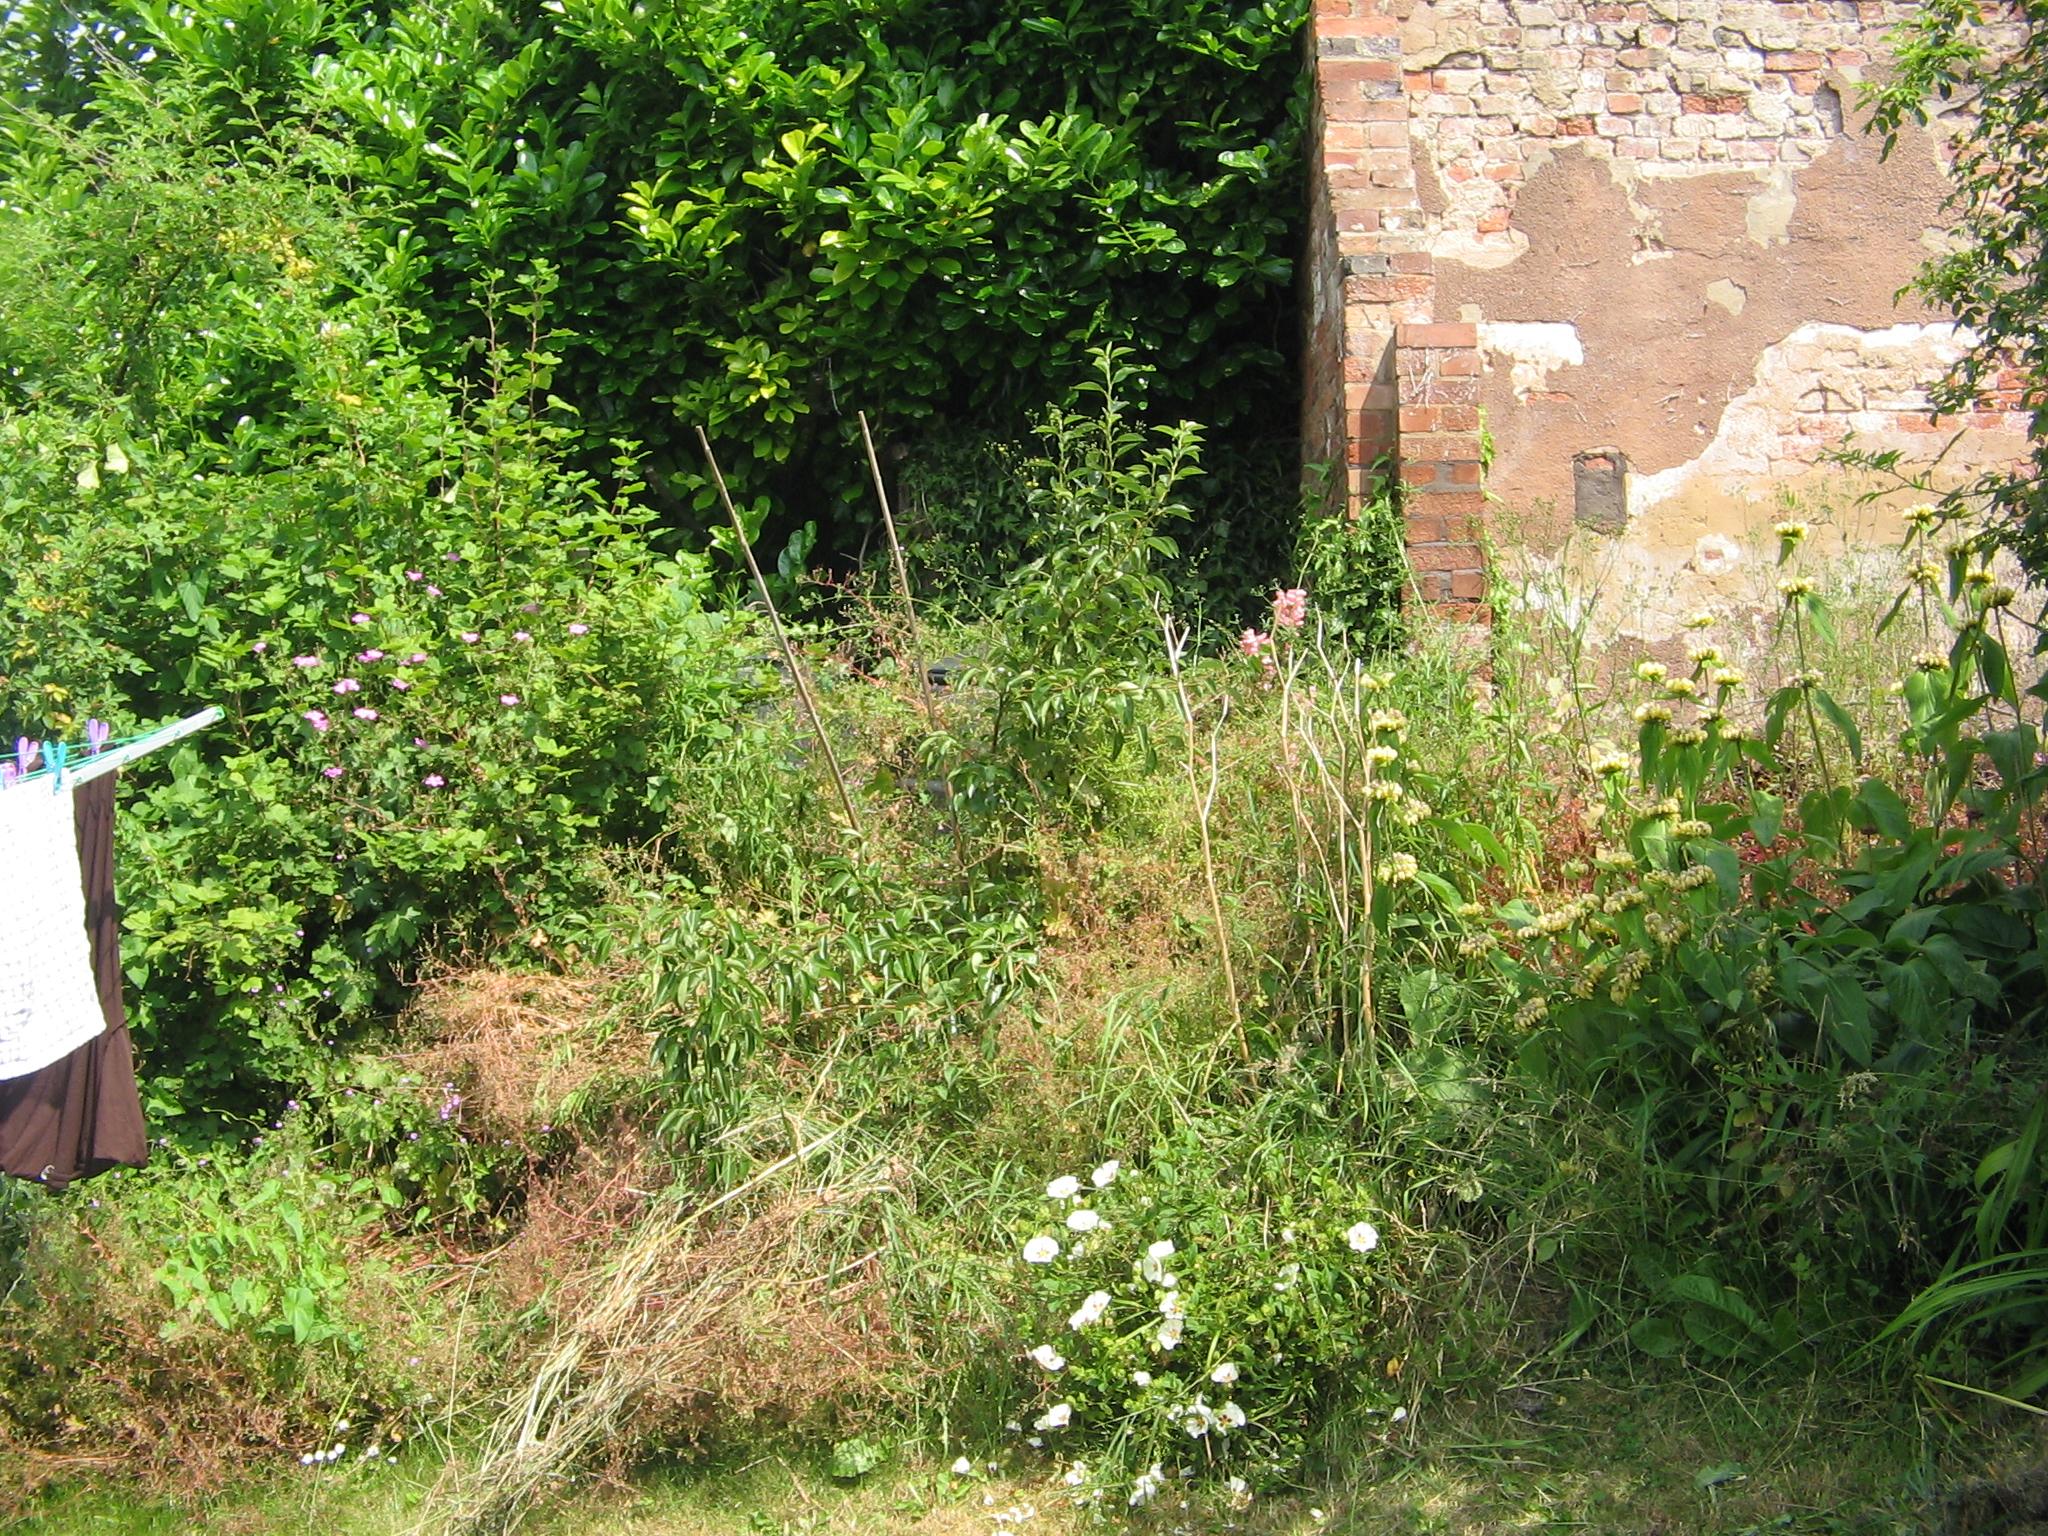 How can you clear an overgrown garden?